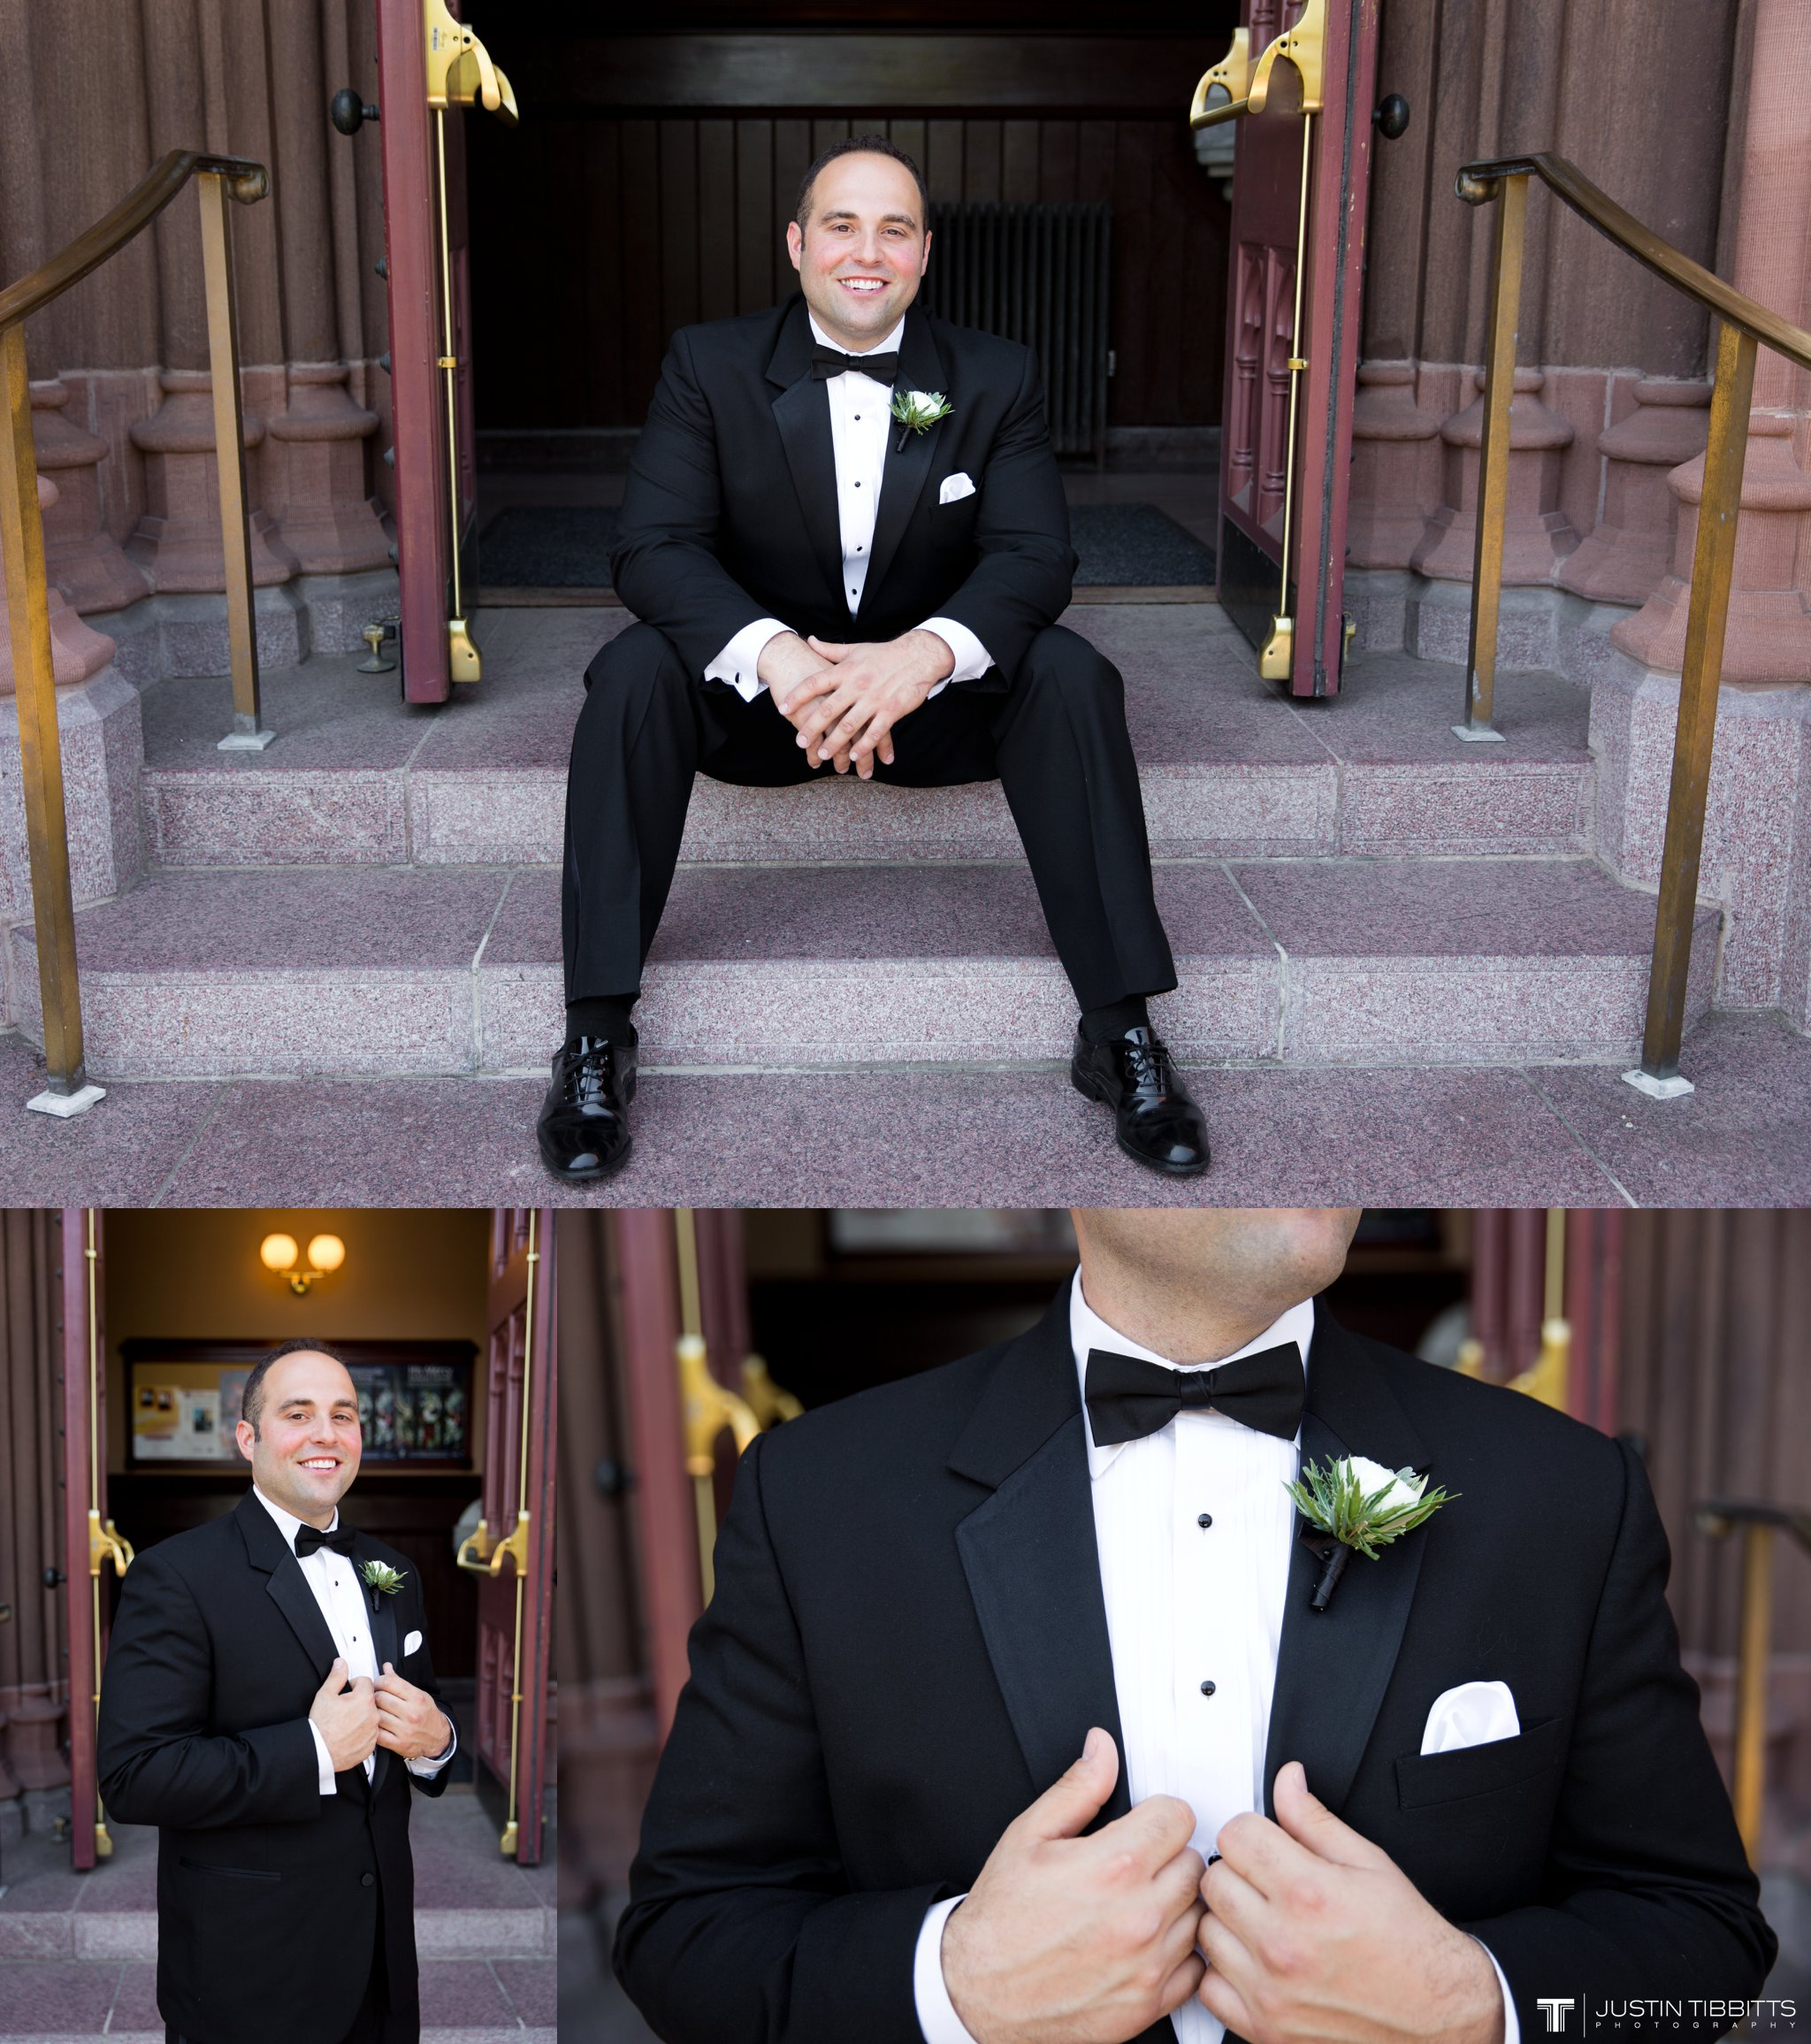 state-room-wedding-photos-with-amanda-and-nick_0067